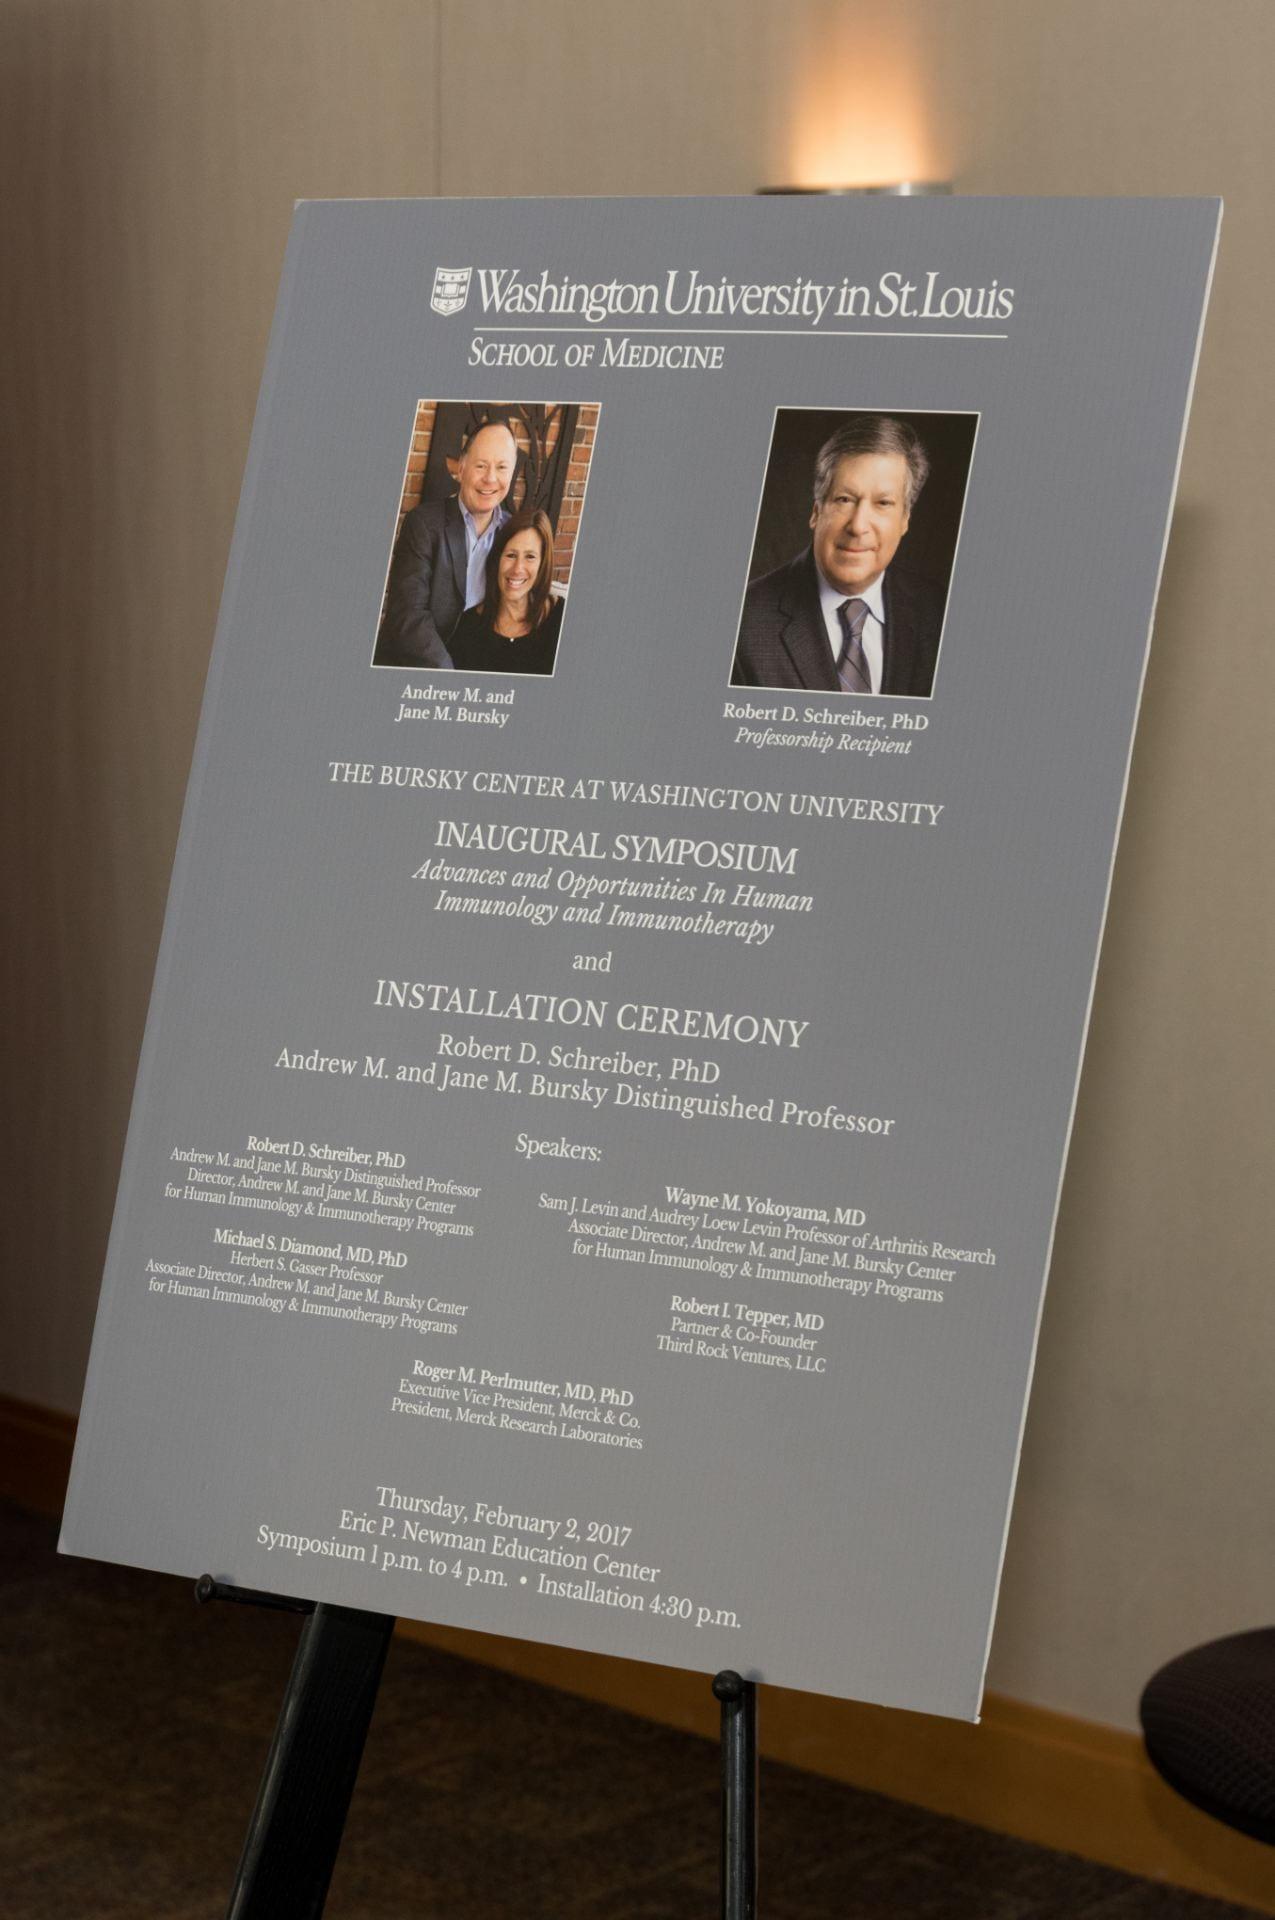 The Bursky Center at Washington University Inaugural Symposium and the Andrew M. and Jane M. Bursky Distinguished Professorship Installation held on Thursday, February 2, 2017